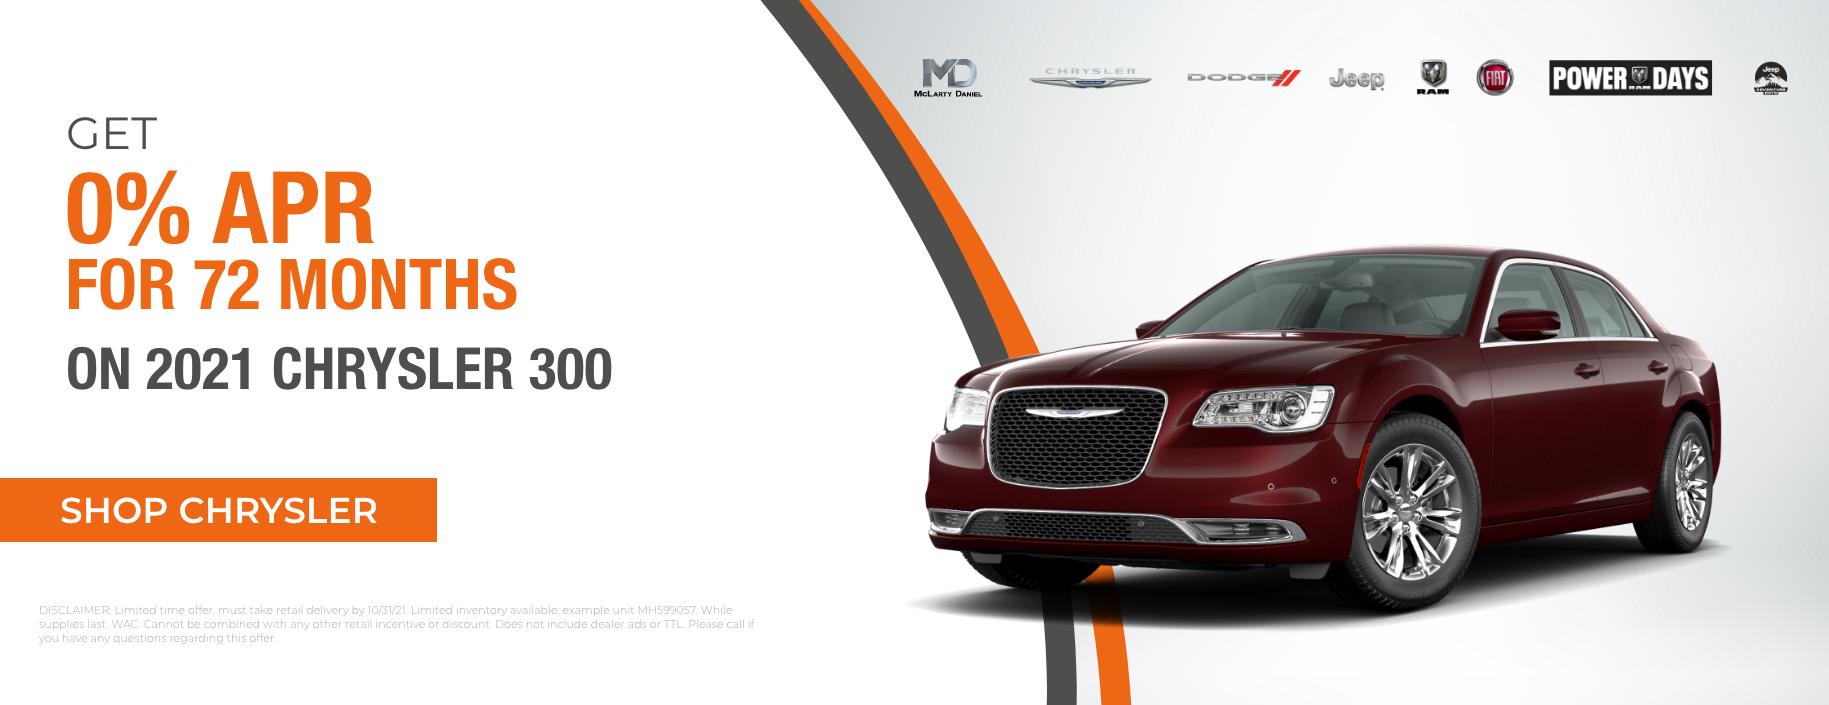 Get 0% for 72 months on 2021 Chrysler 300!